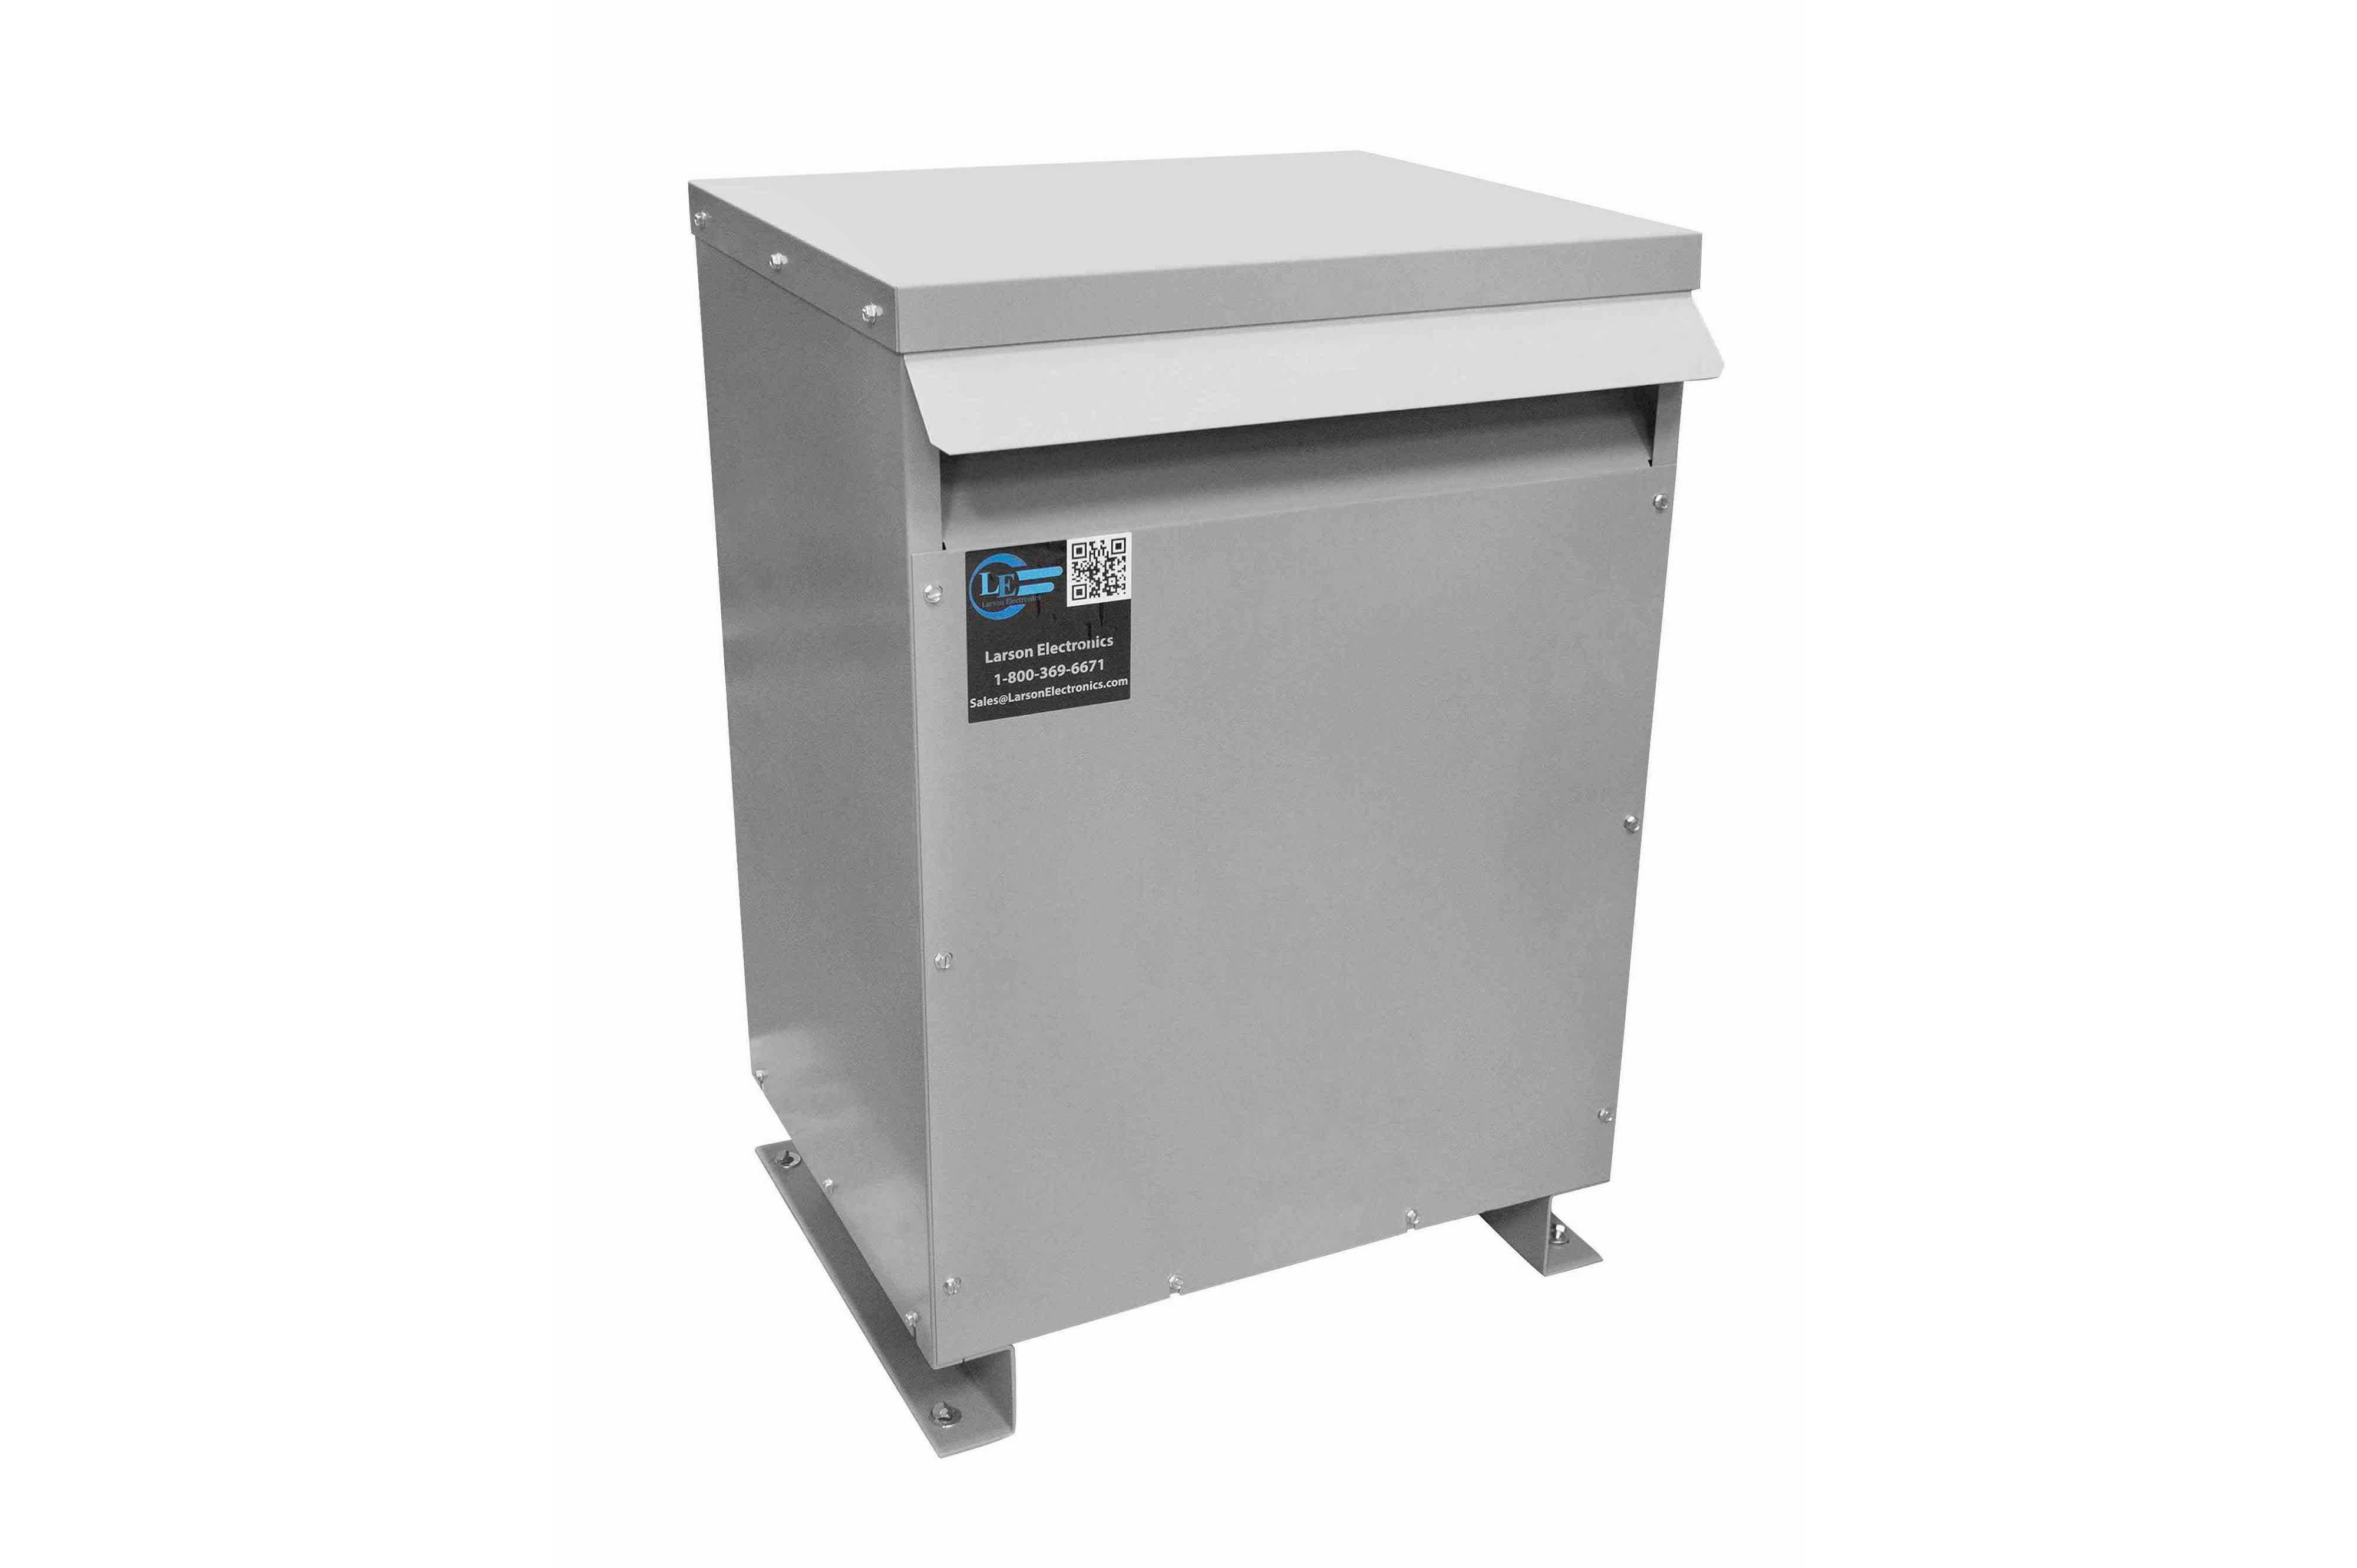 14 kVA 3PH Isolation Transformer, 208V Wye Primary, 600Y/347 Wye-N Secondary, N3R, Ventilated, 60 Hz